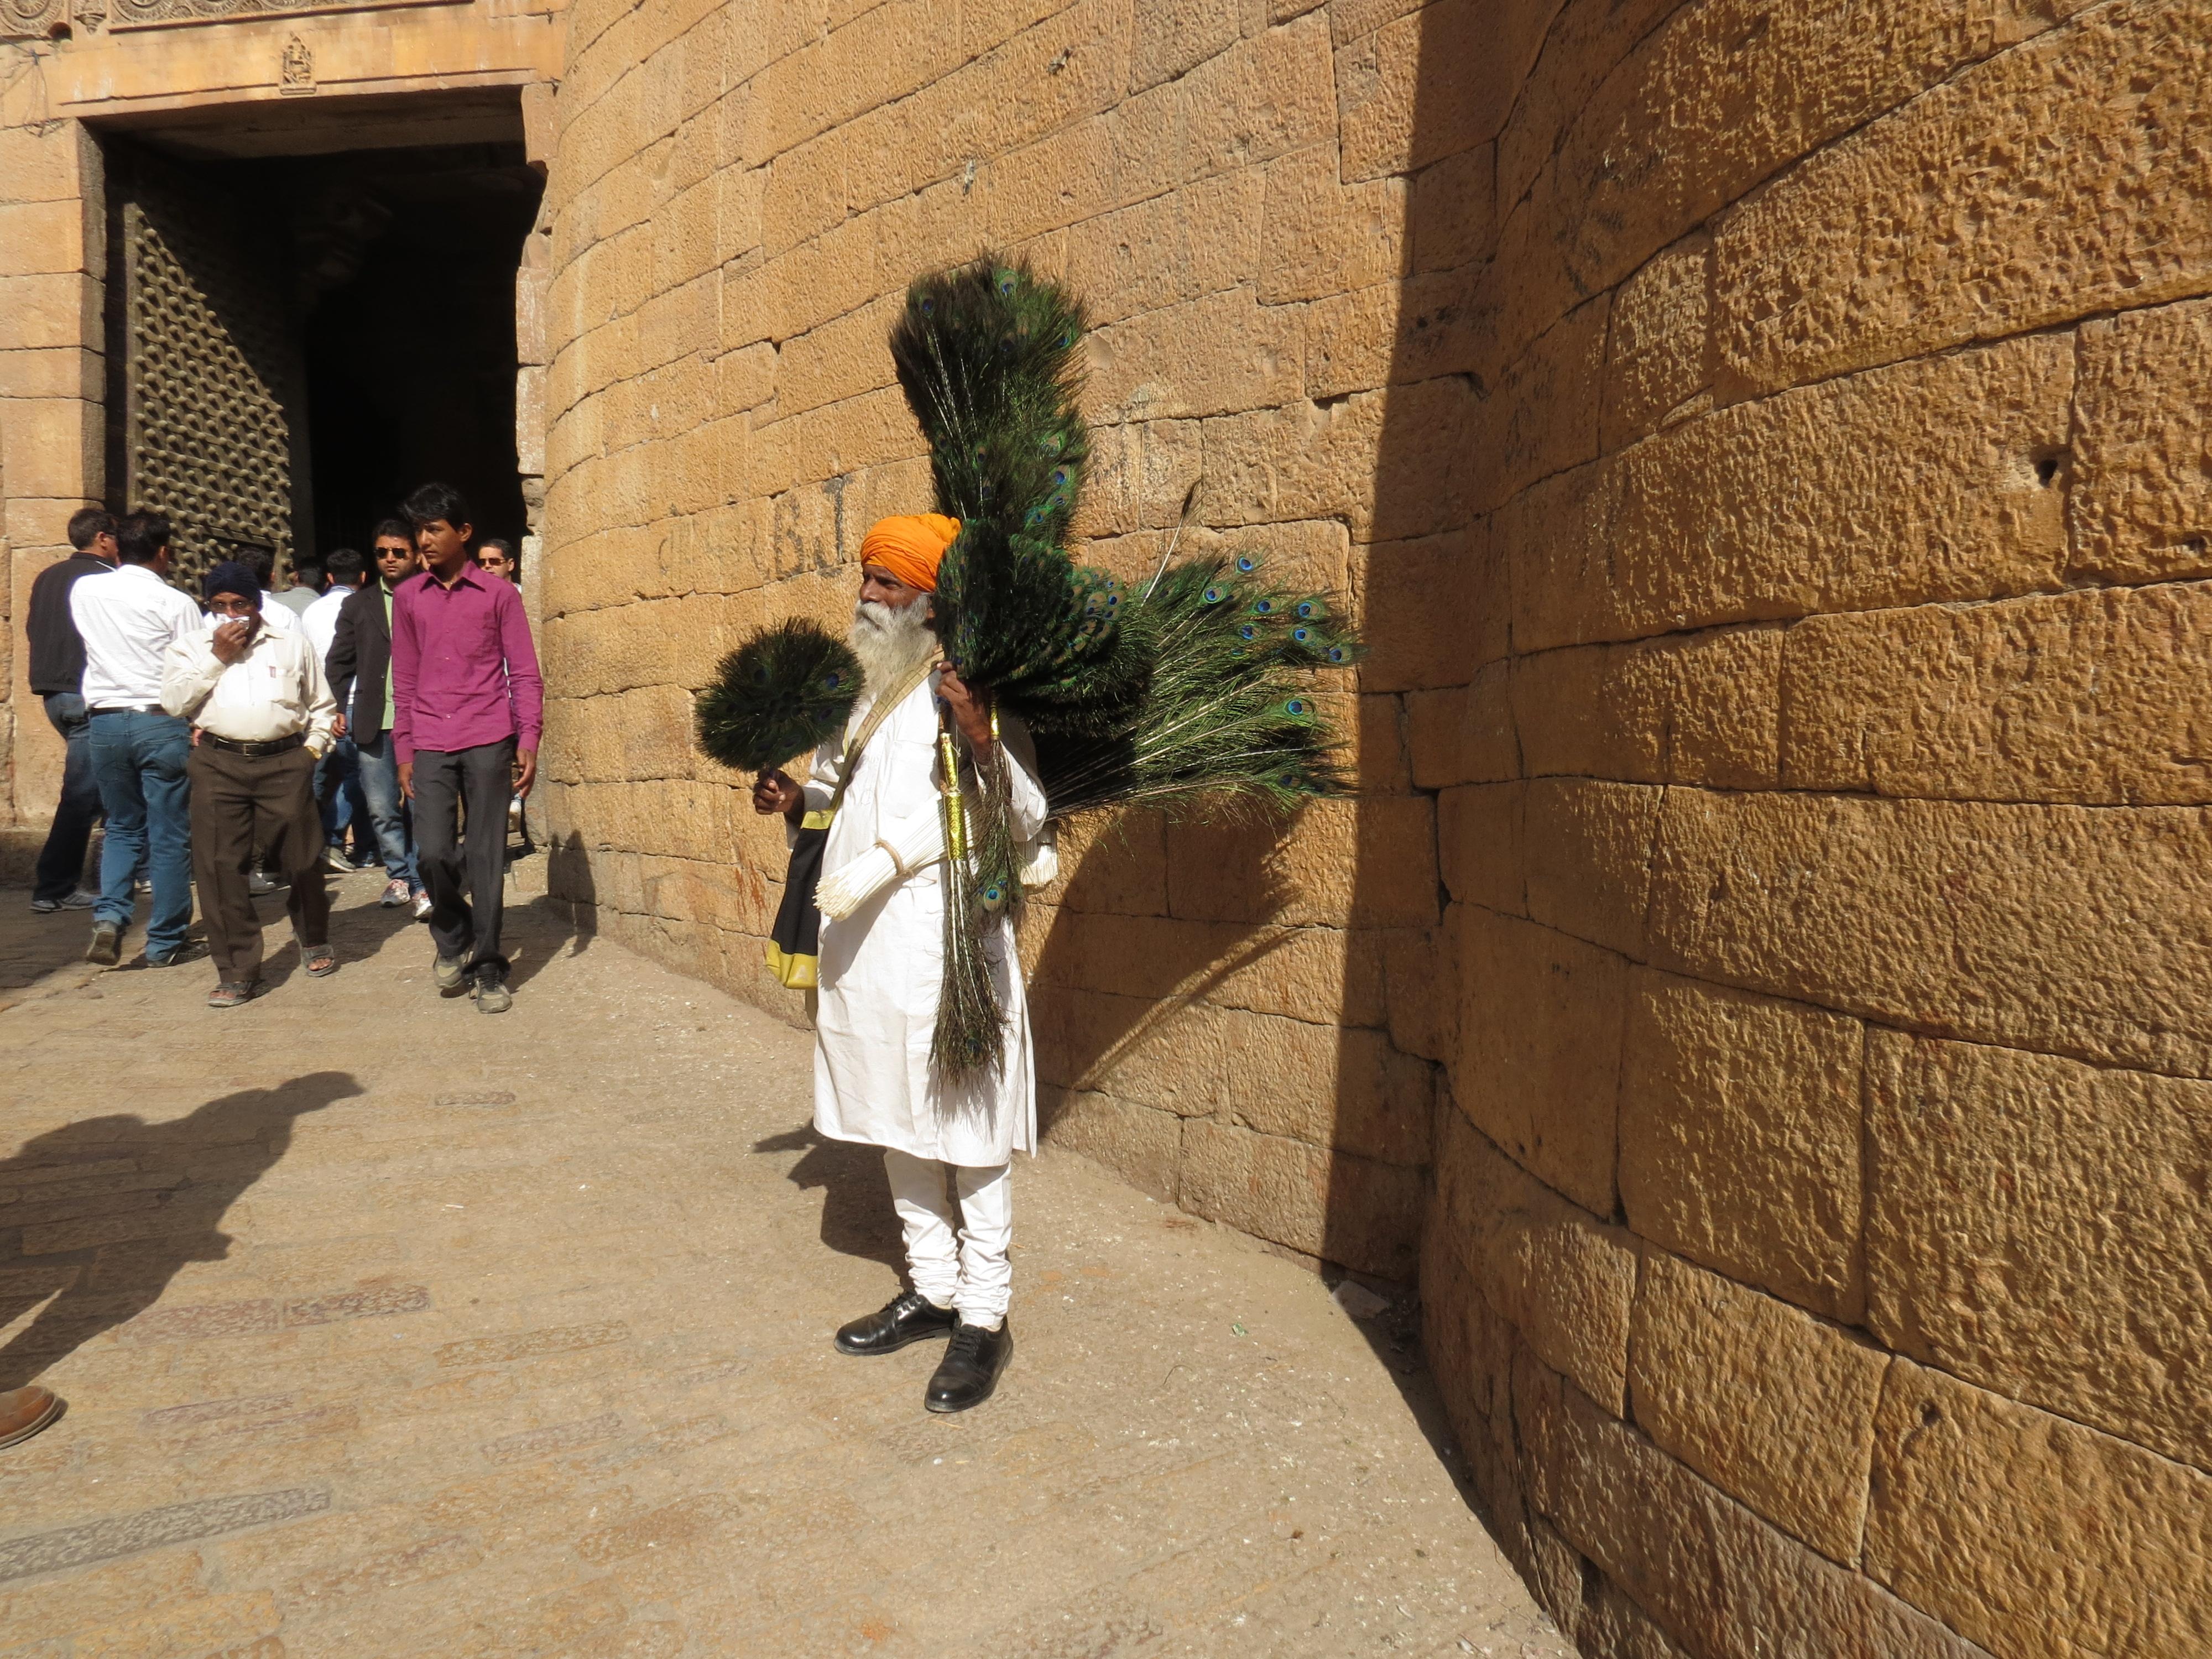 Luca Errera, Daniela Trastulli, India, Rajasthan, Jaisalmer, venditore, penne di pavone